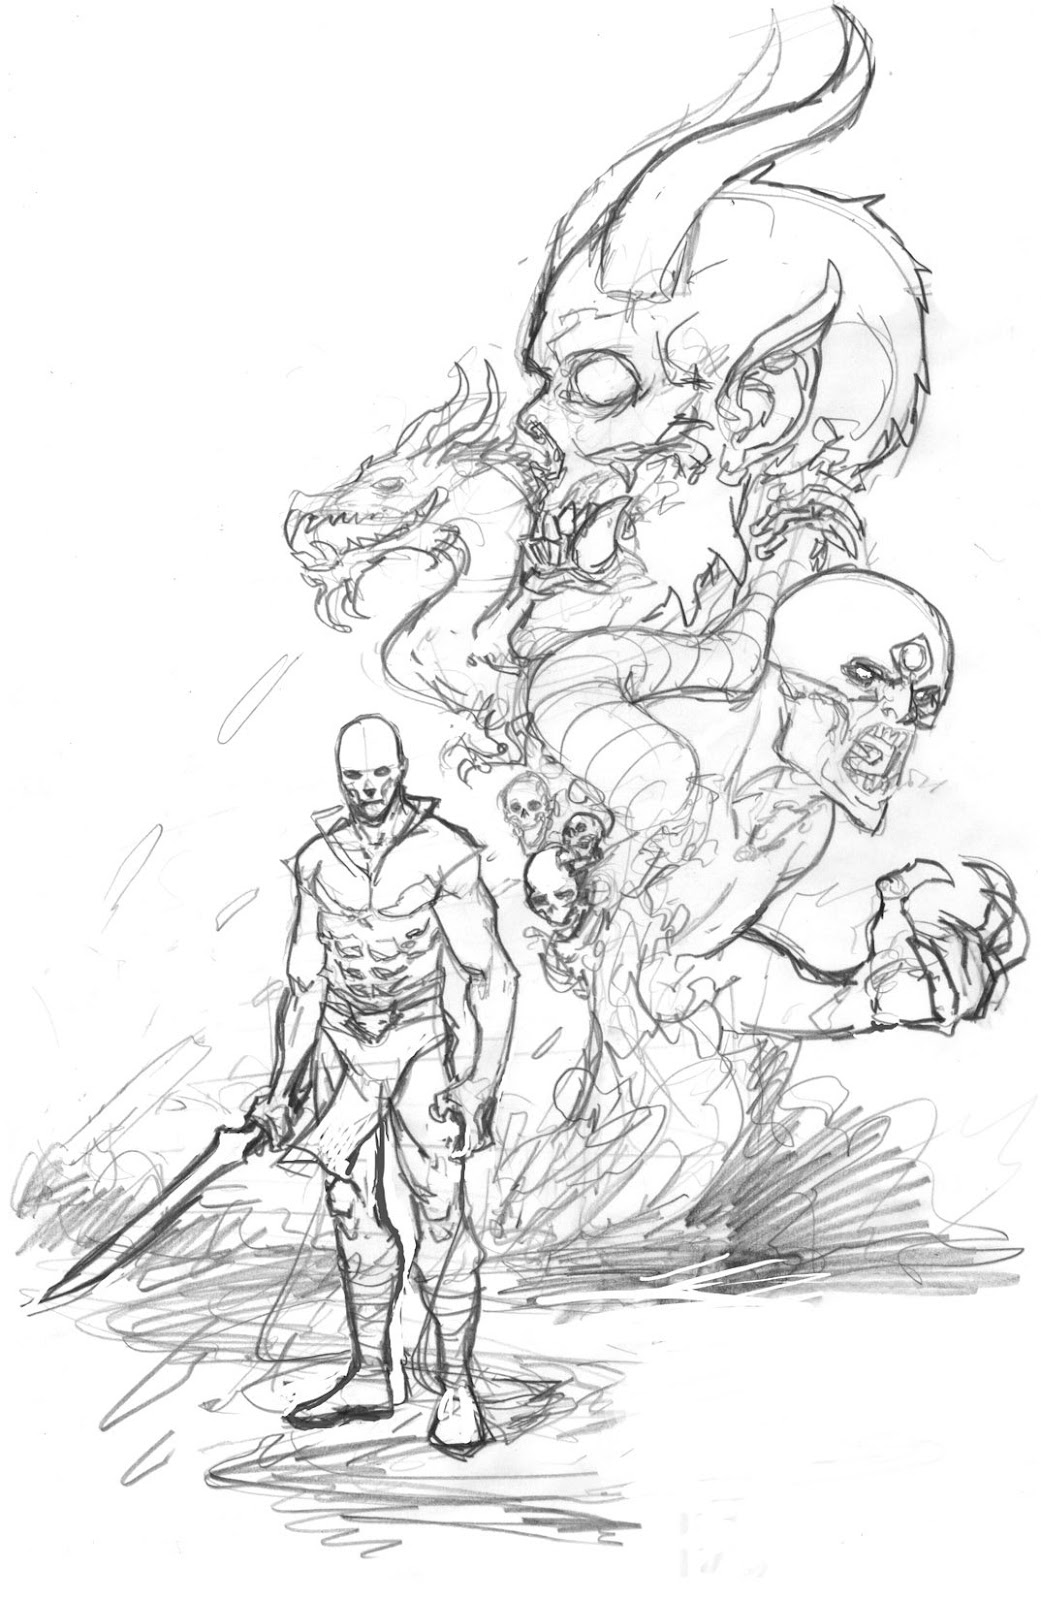 Read online Reaper comic -  Issue #2 - 43